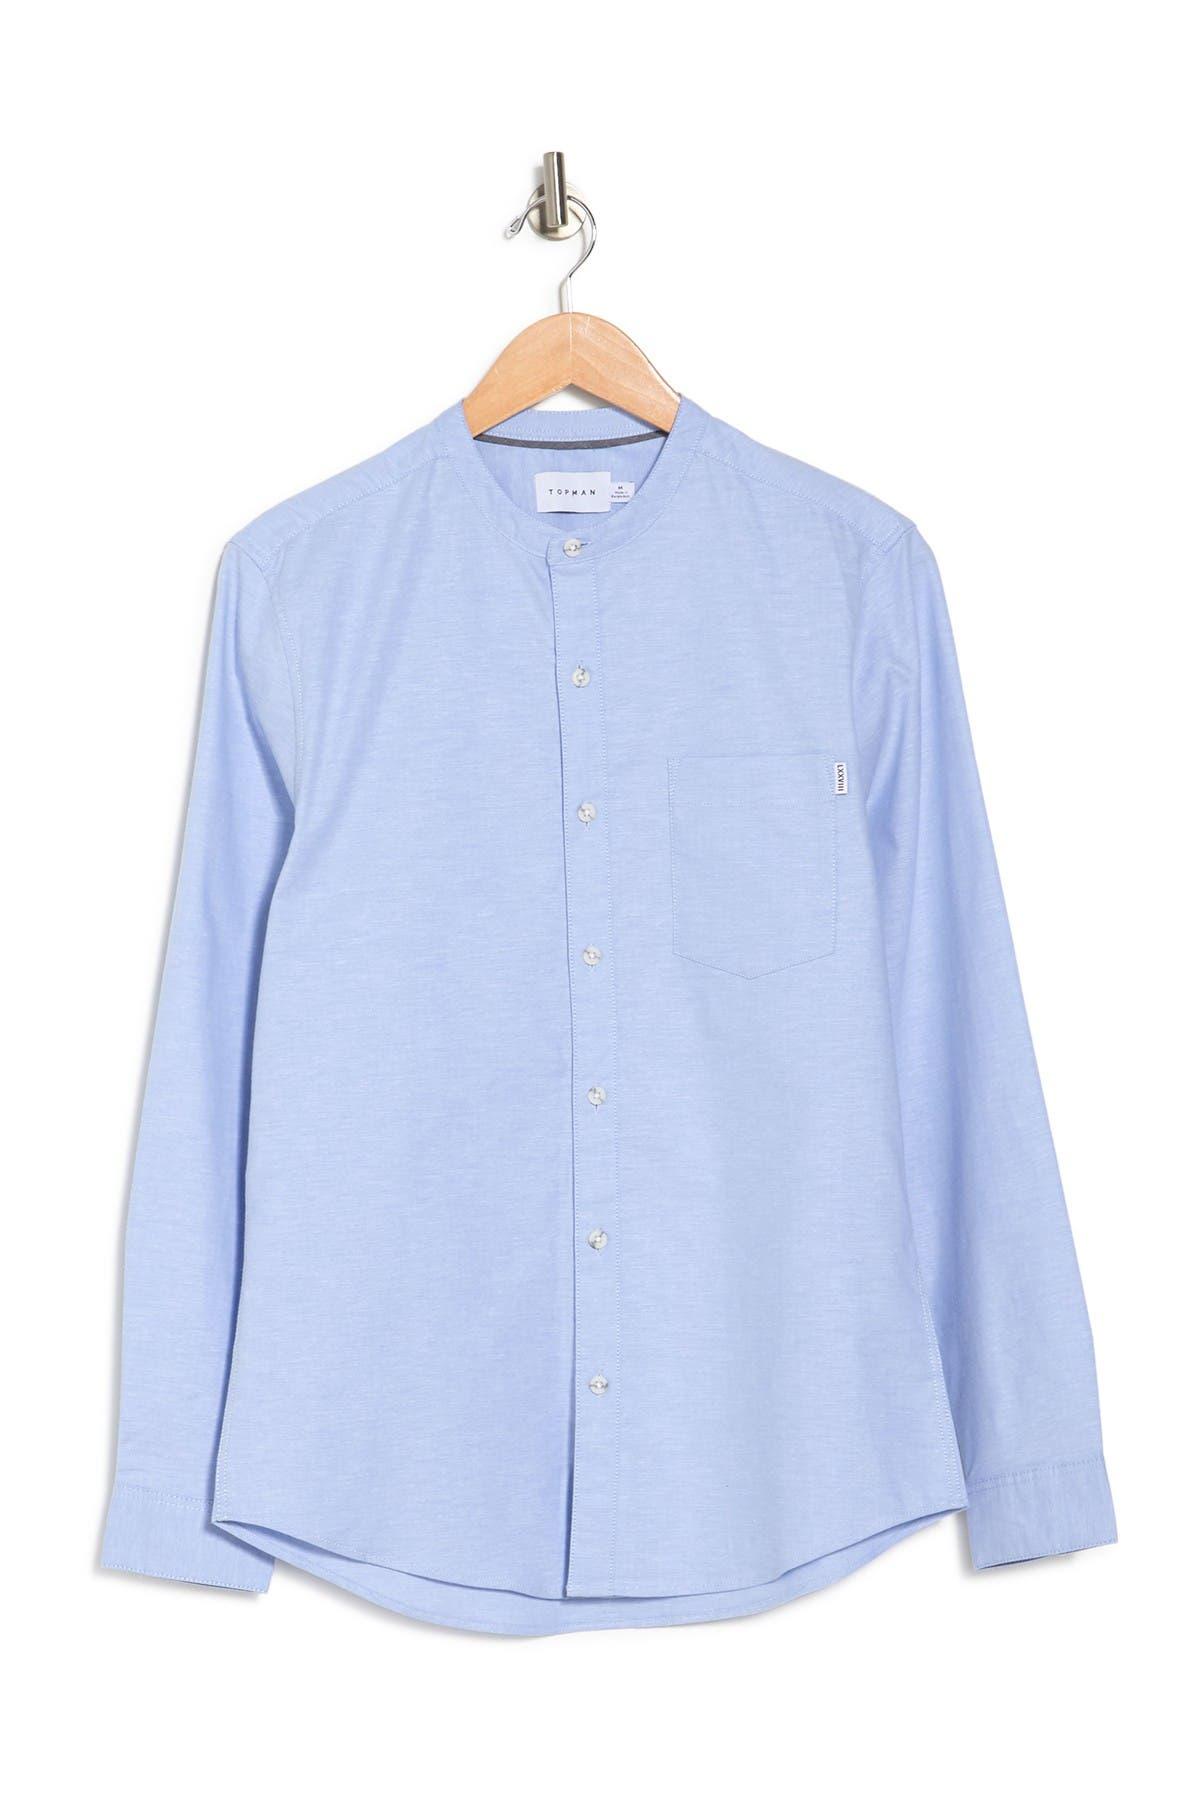 Image of TOPMAN Heathered Band Collar Shirt